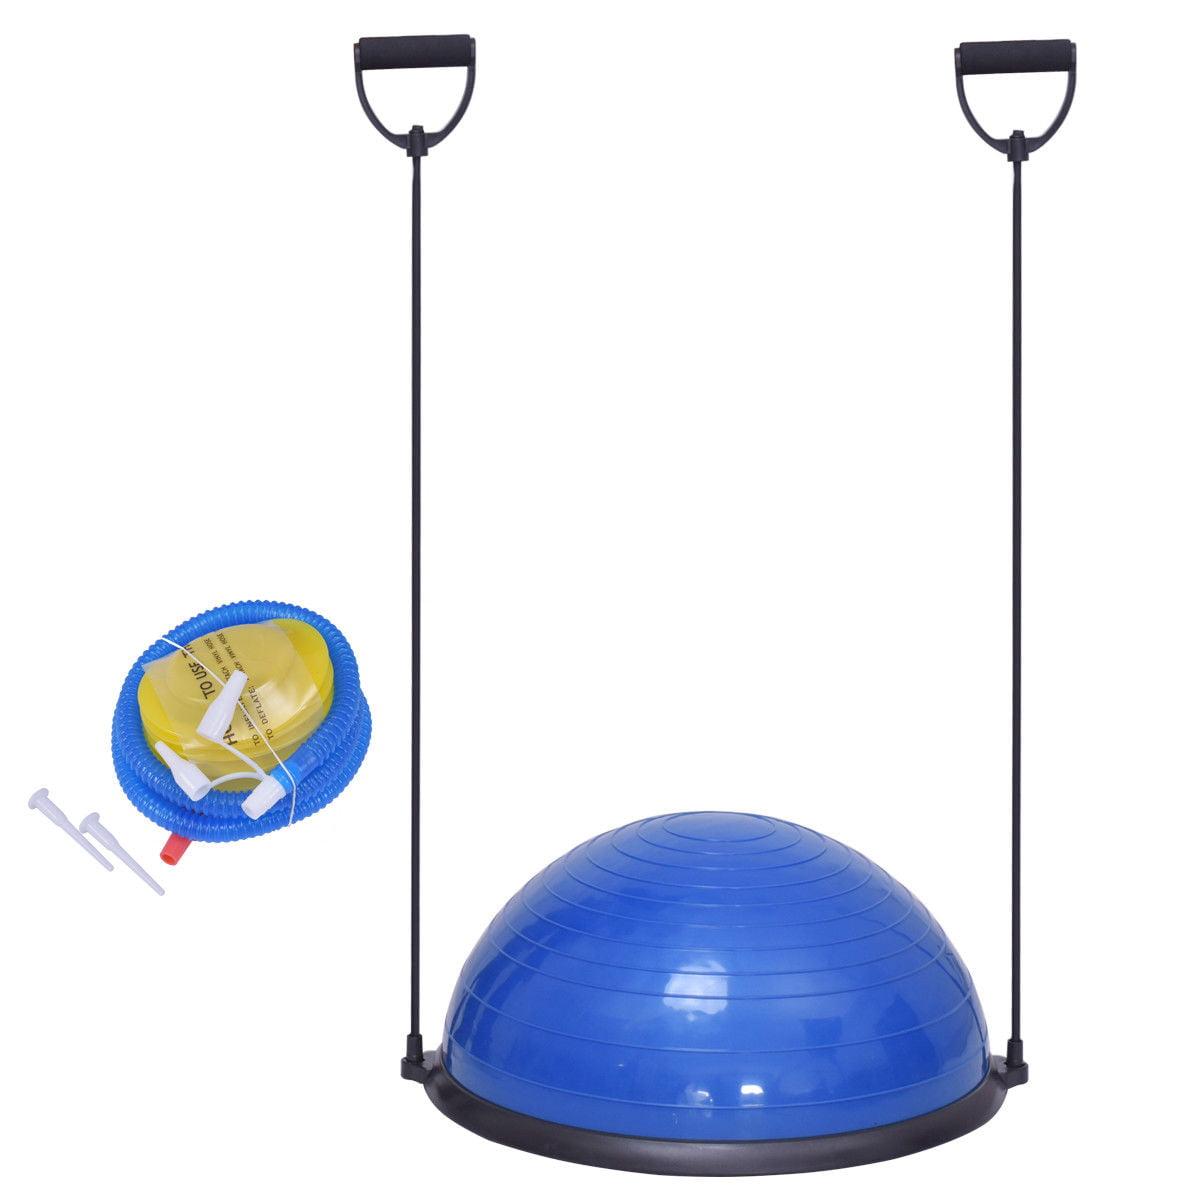 "23"" Blue Yoga Ball Balance Trainer w/ Pump Home Exercise Training Fitness - image 7 de 8"